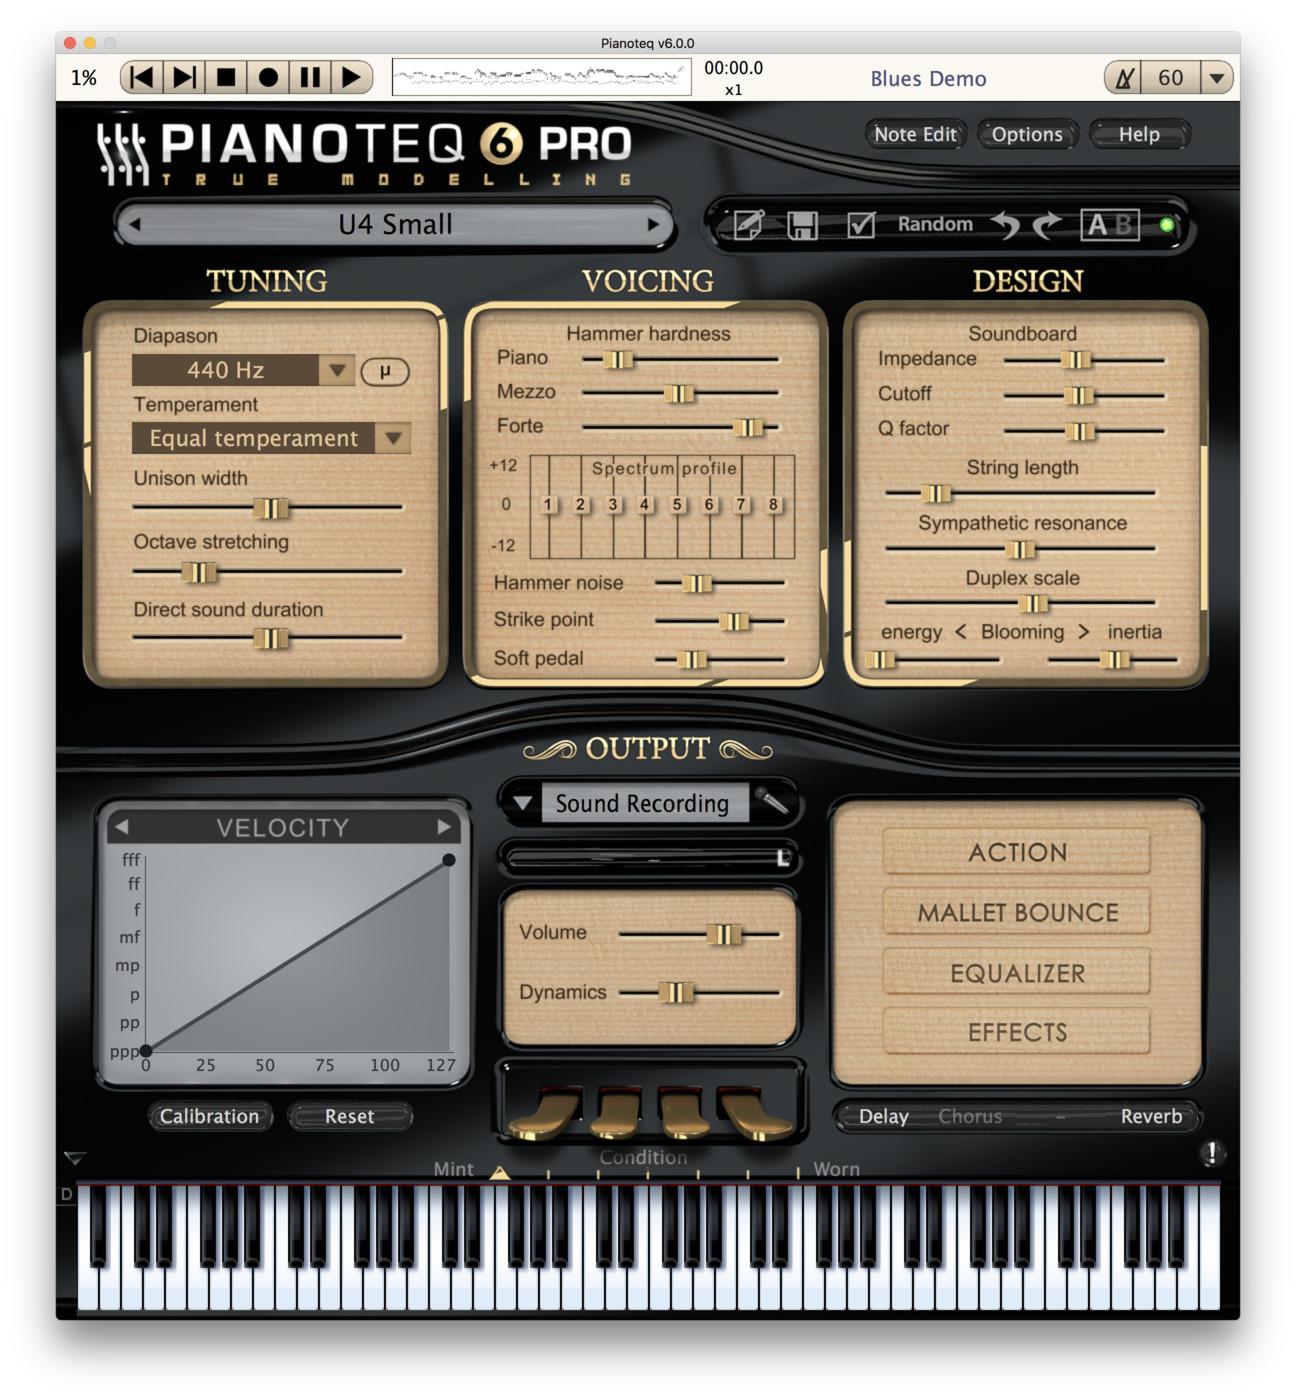 U4 Upright Piano